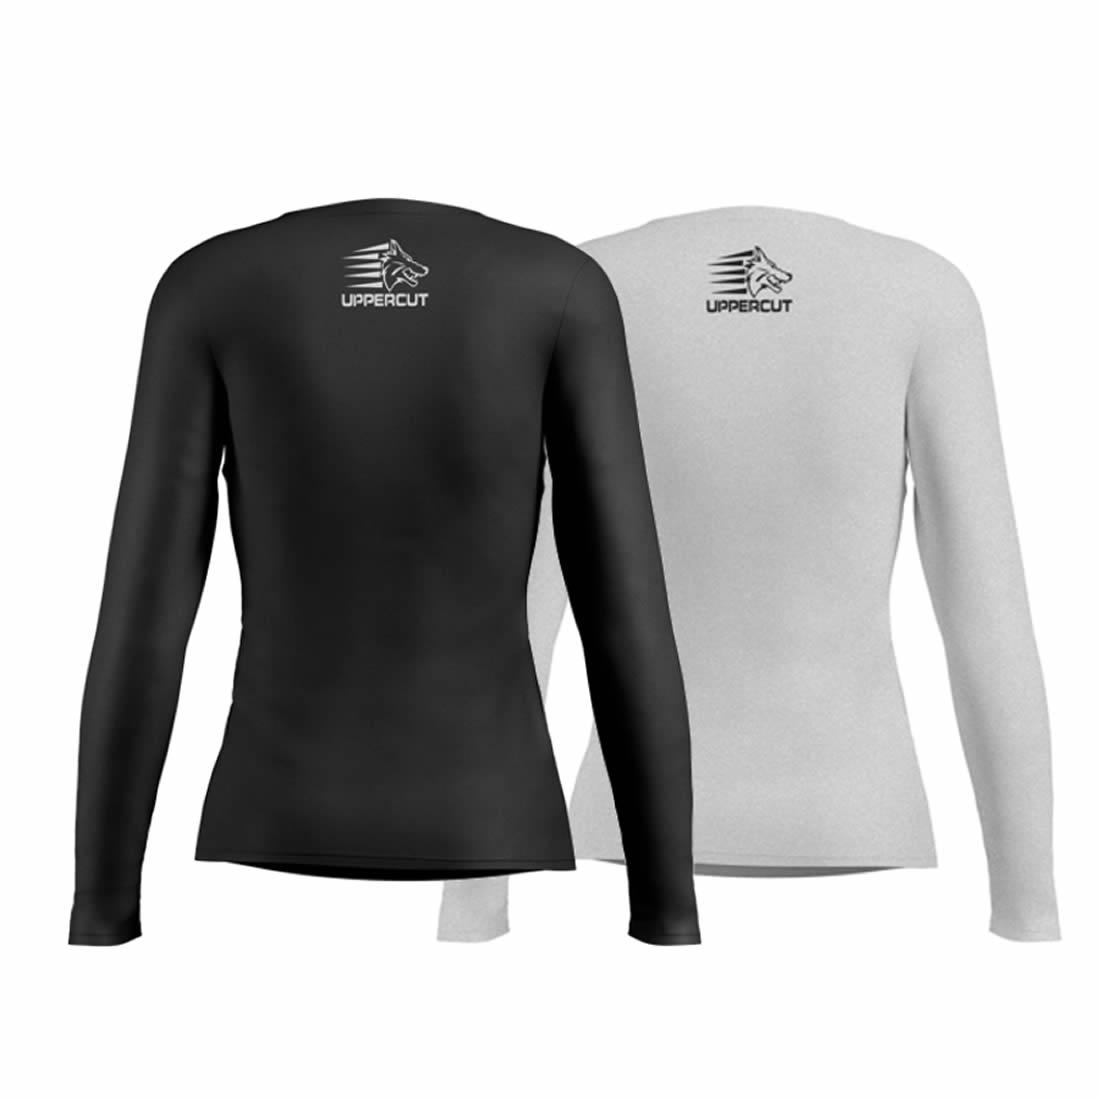 Kit 2 Camisas UV-50+ - Corrida Running Feminina - Kt16